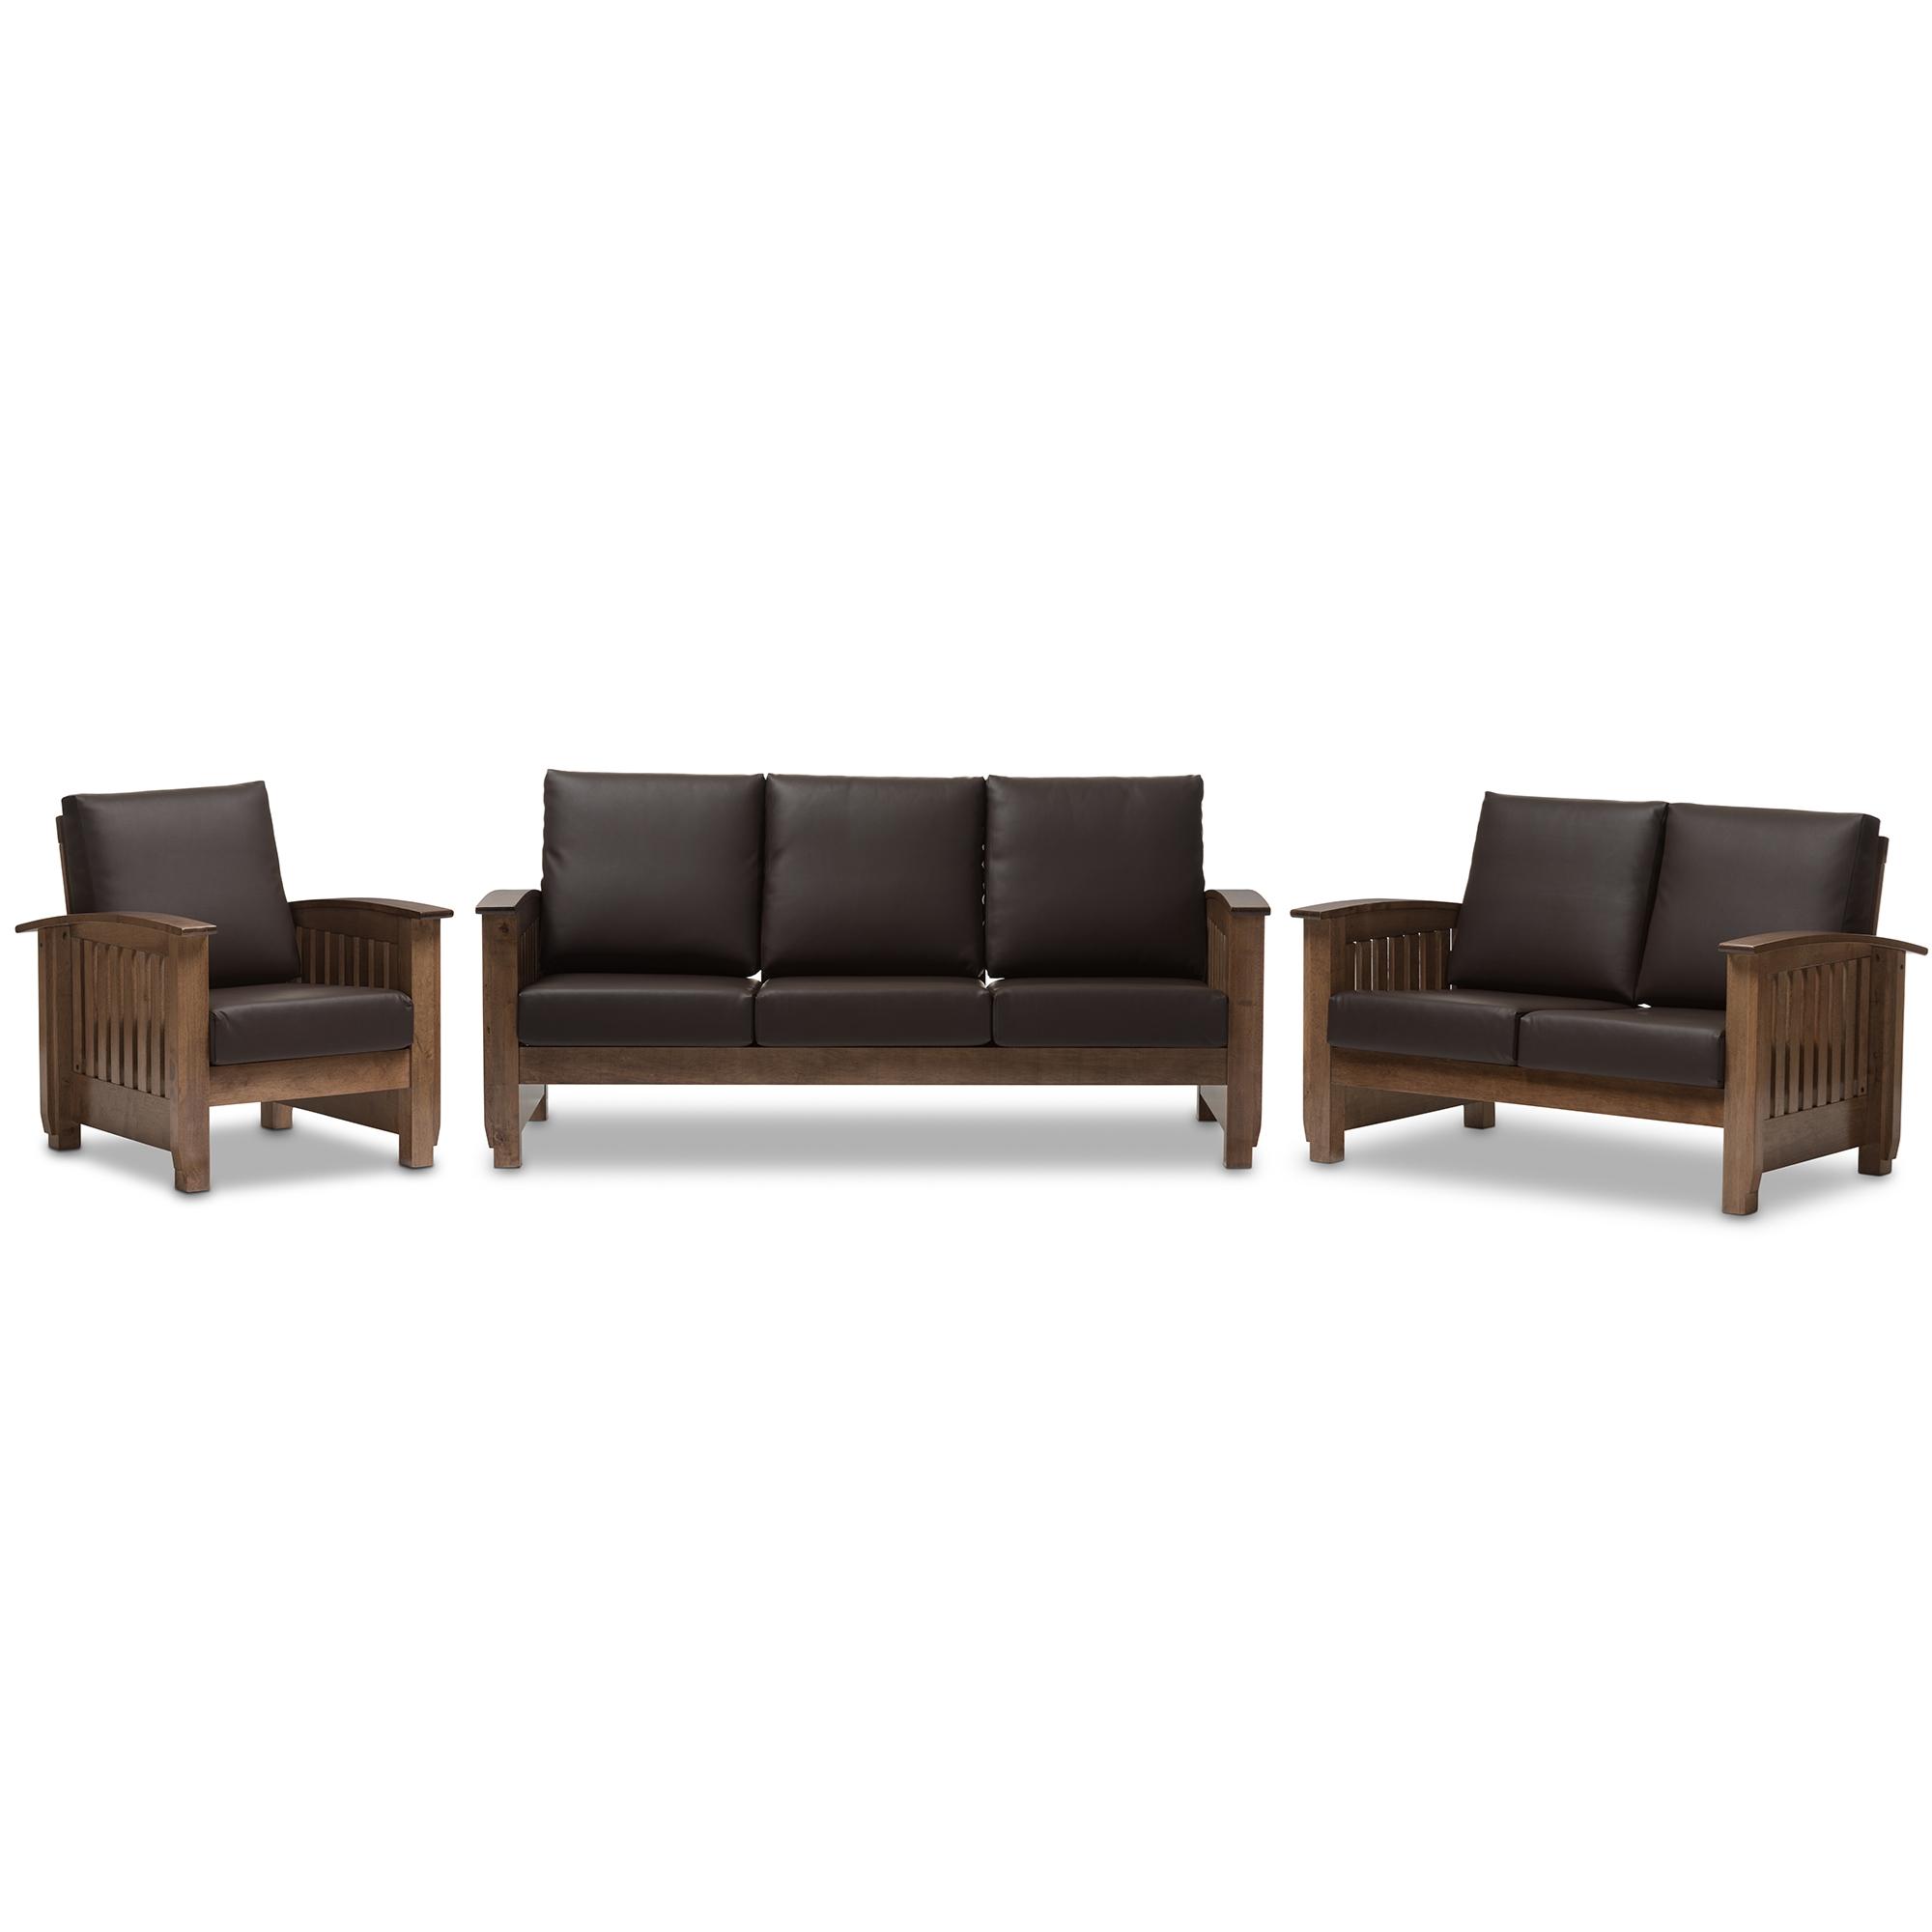 mission brown leather sofa small designer sofas baxton studio charlotte modern classic style